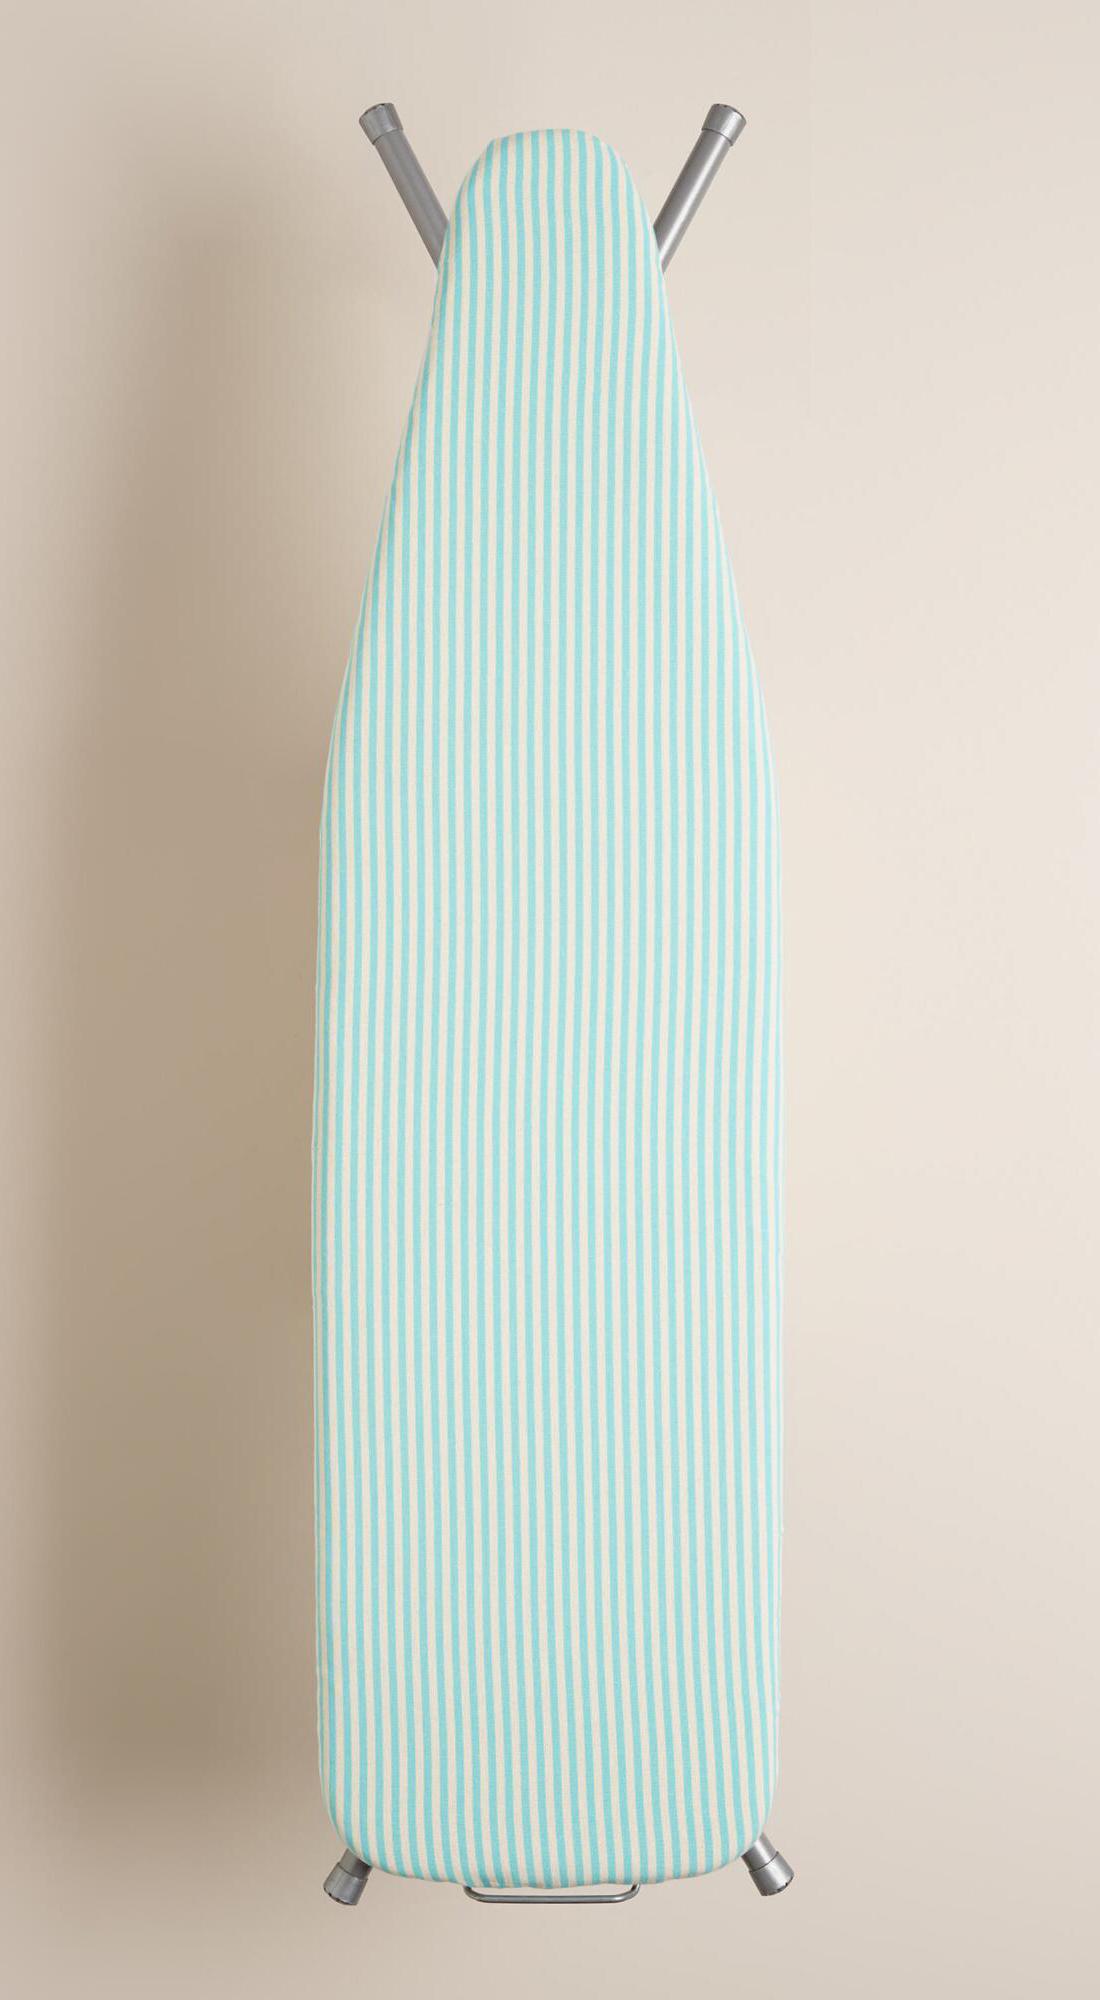 Aqua Ticking Stripe Ironing Board Cover